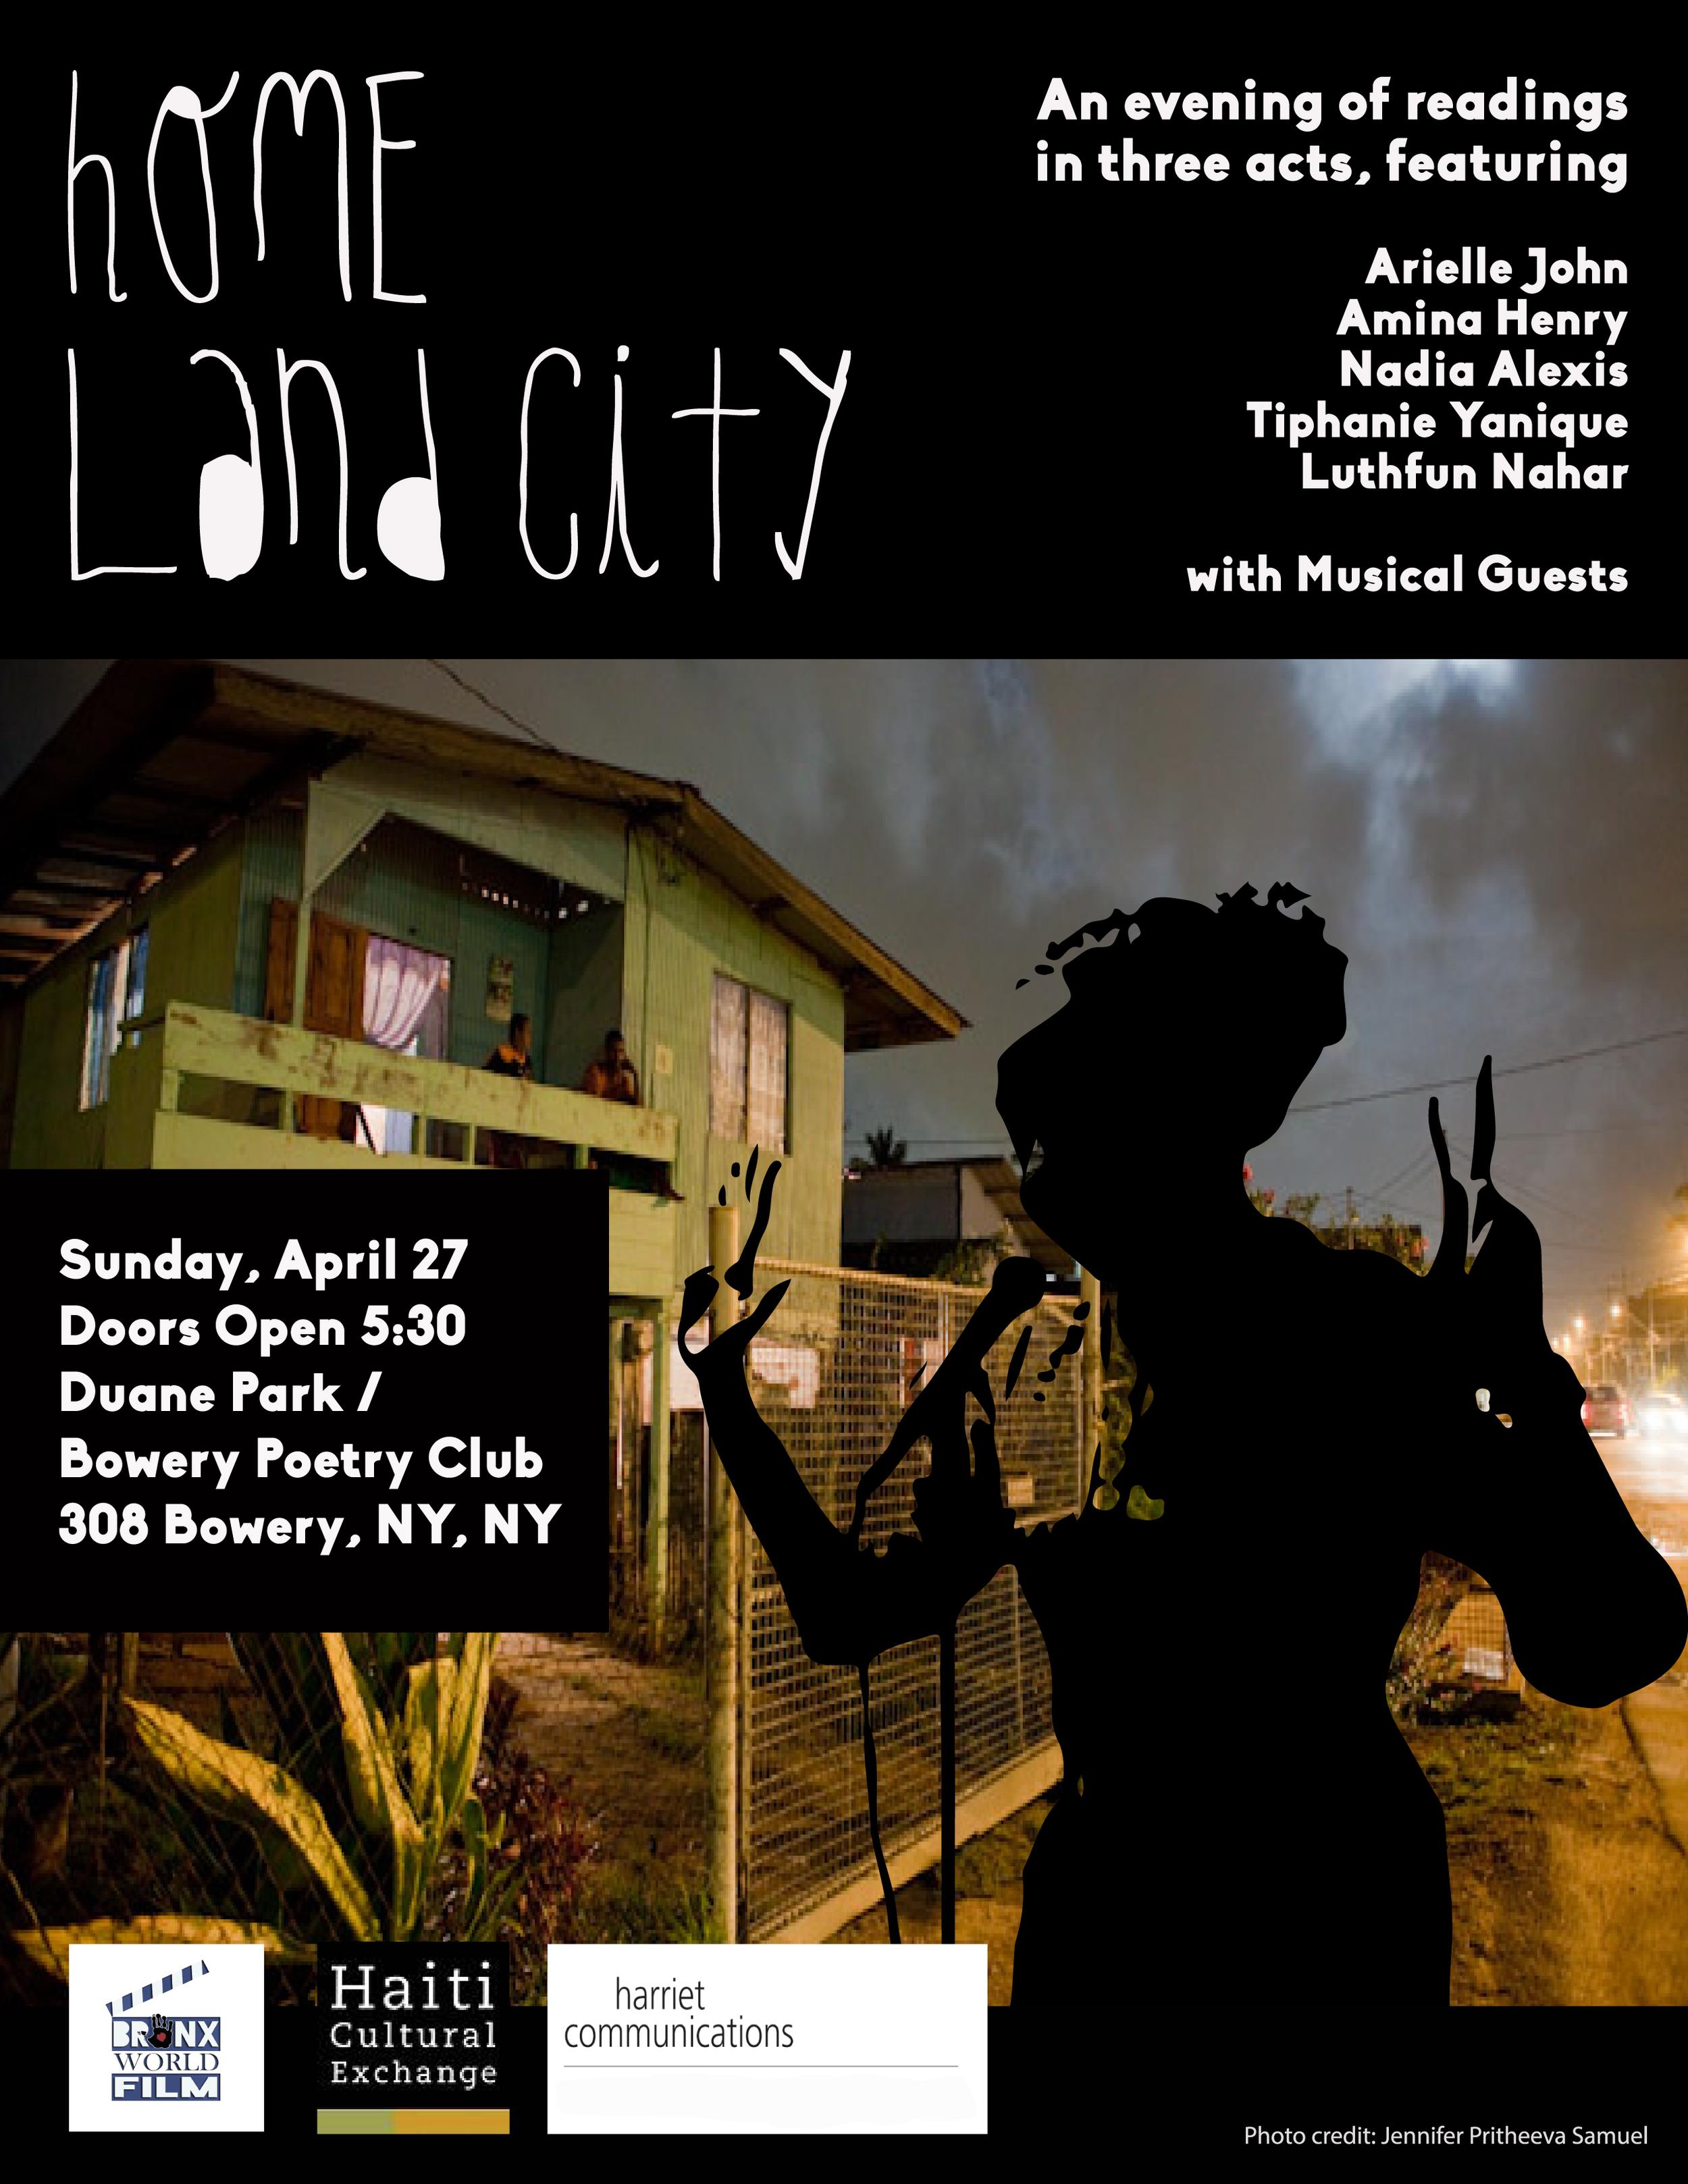 Home Land City Flyer.jpg